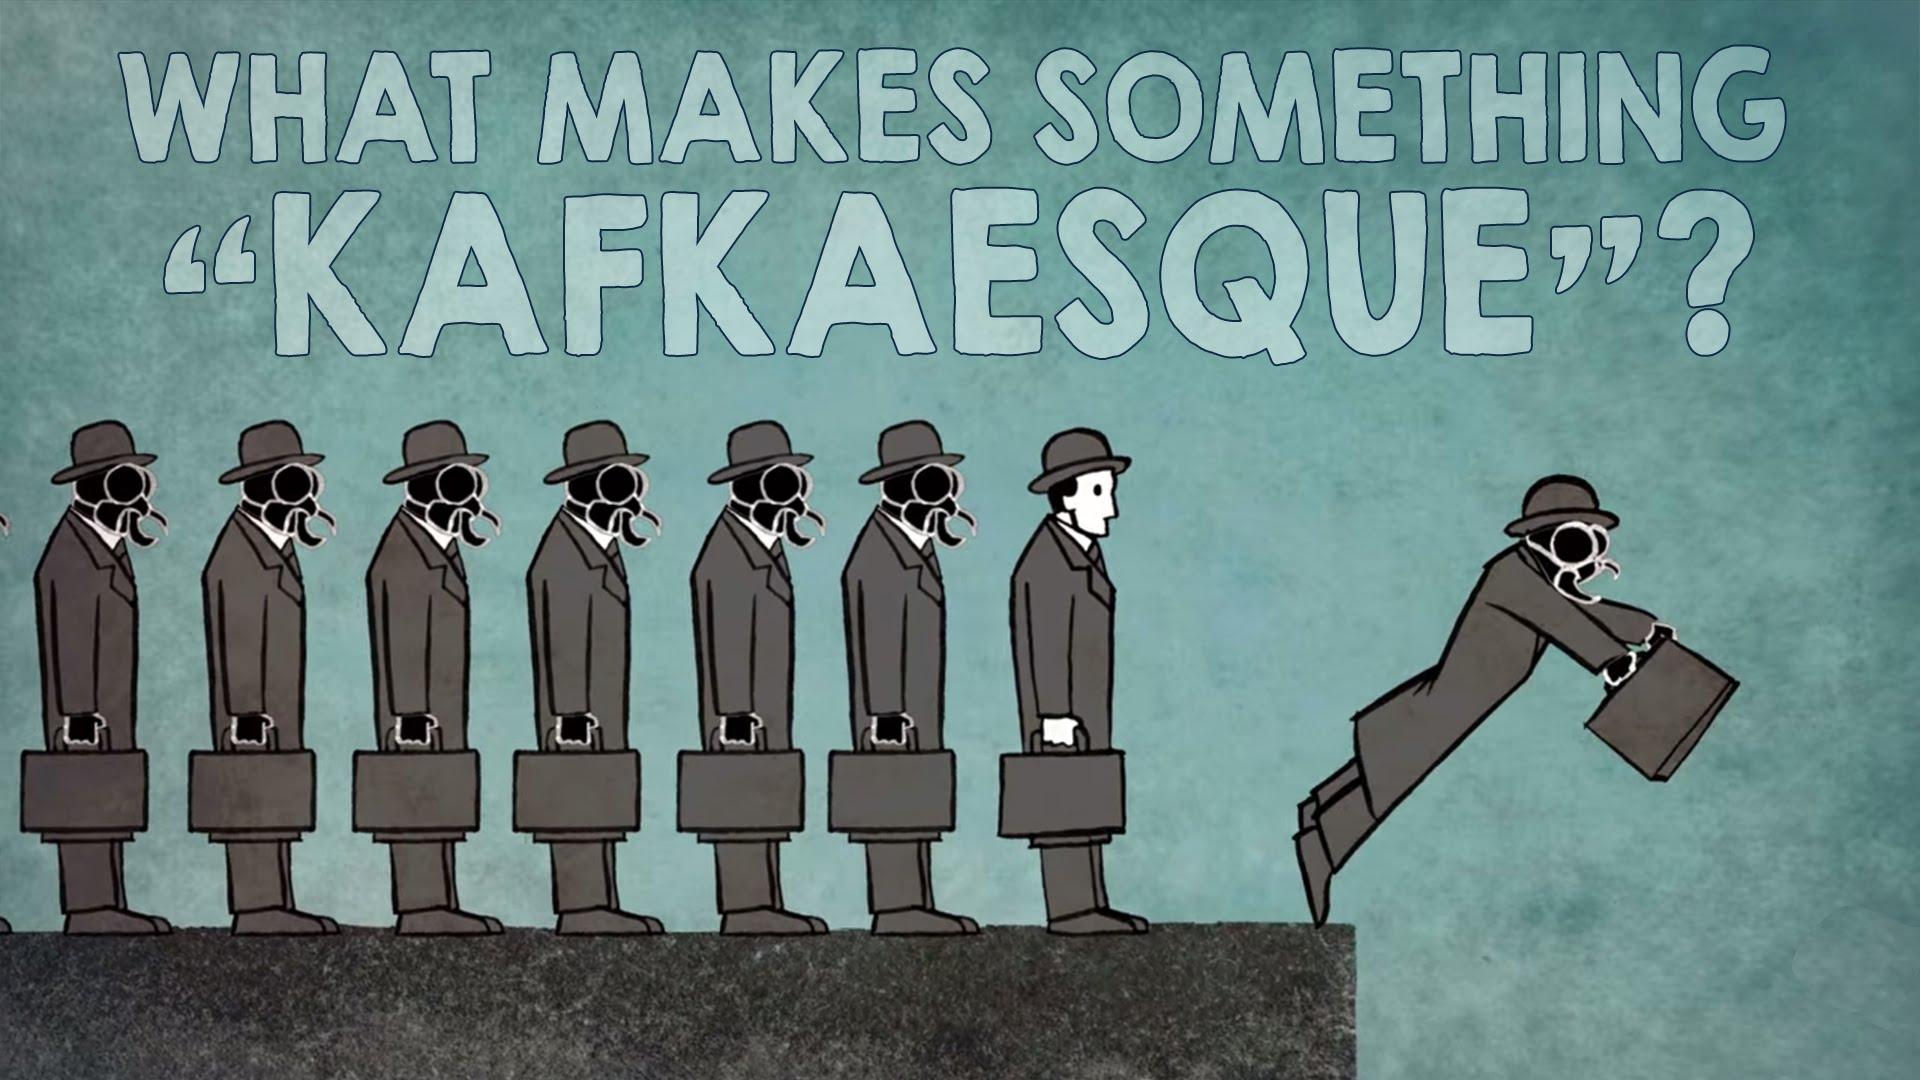 Paradoxul lui Kafka